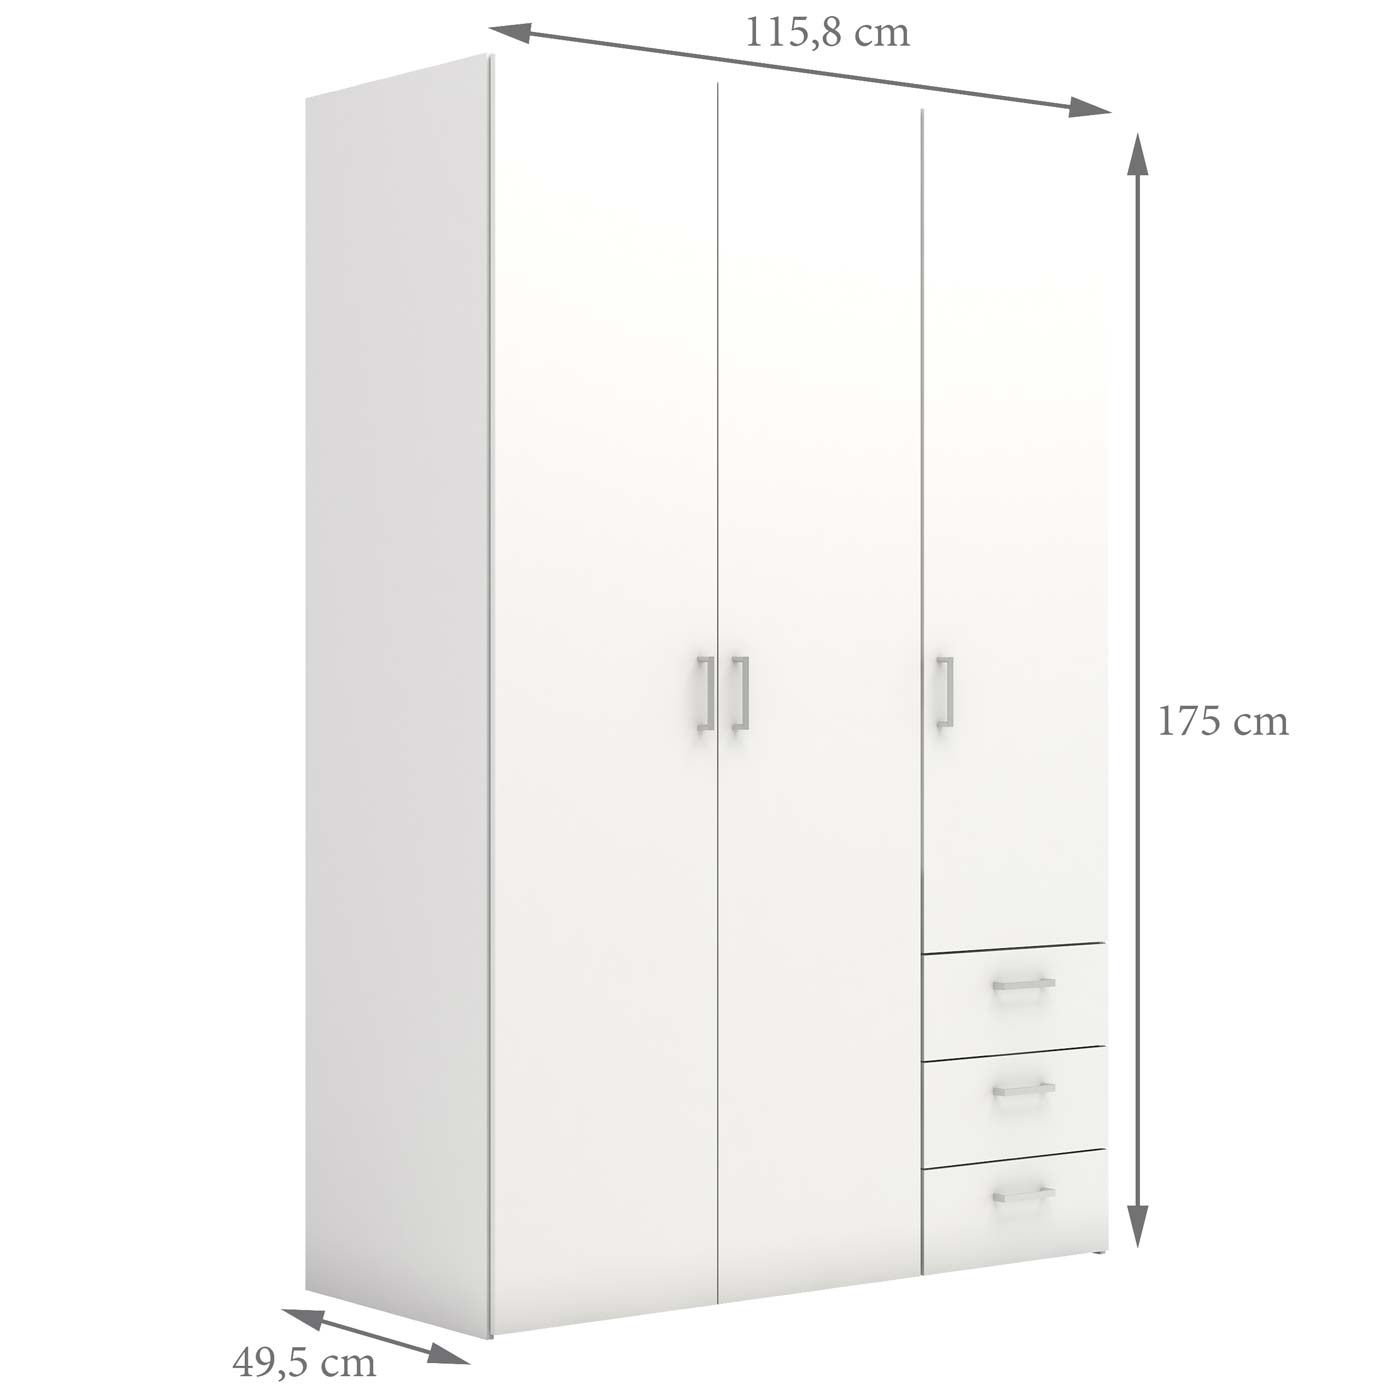 Space garderobeskab hvid 3 låger 3 skuffer 175x115